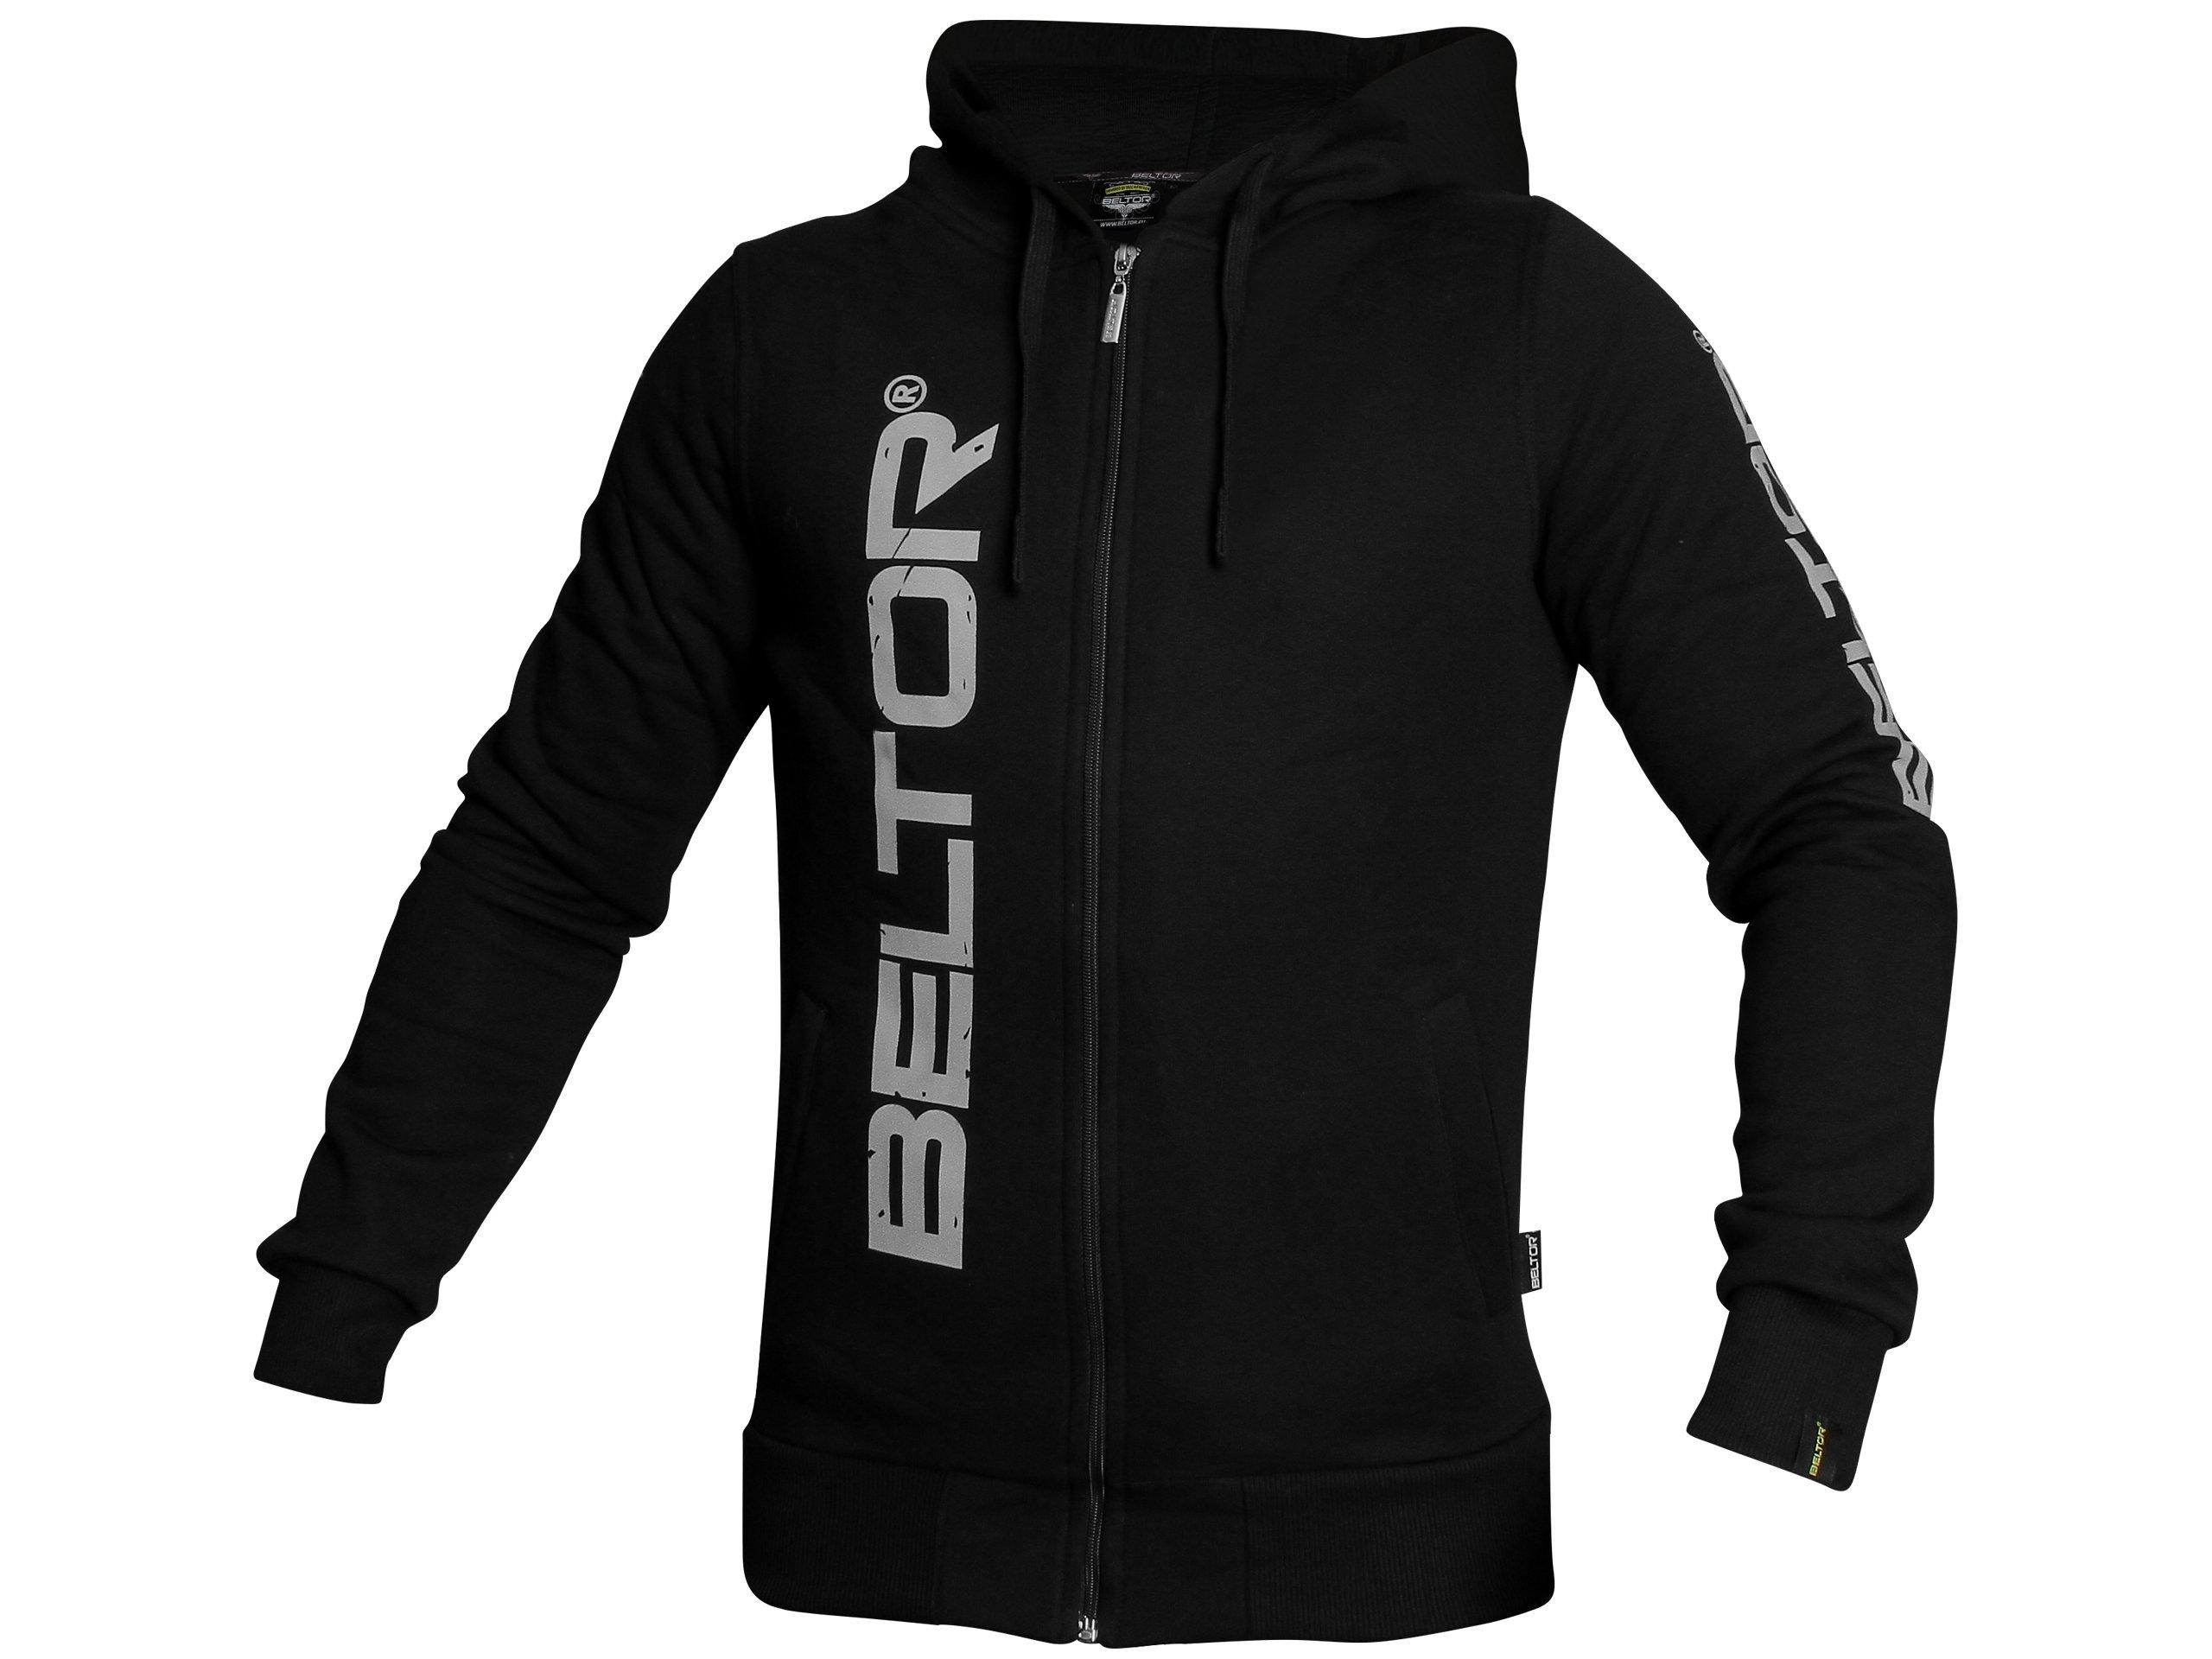 BELTOR BW Mikina na Zips s kapucňou, Originálne čierna XXL